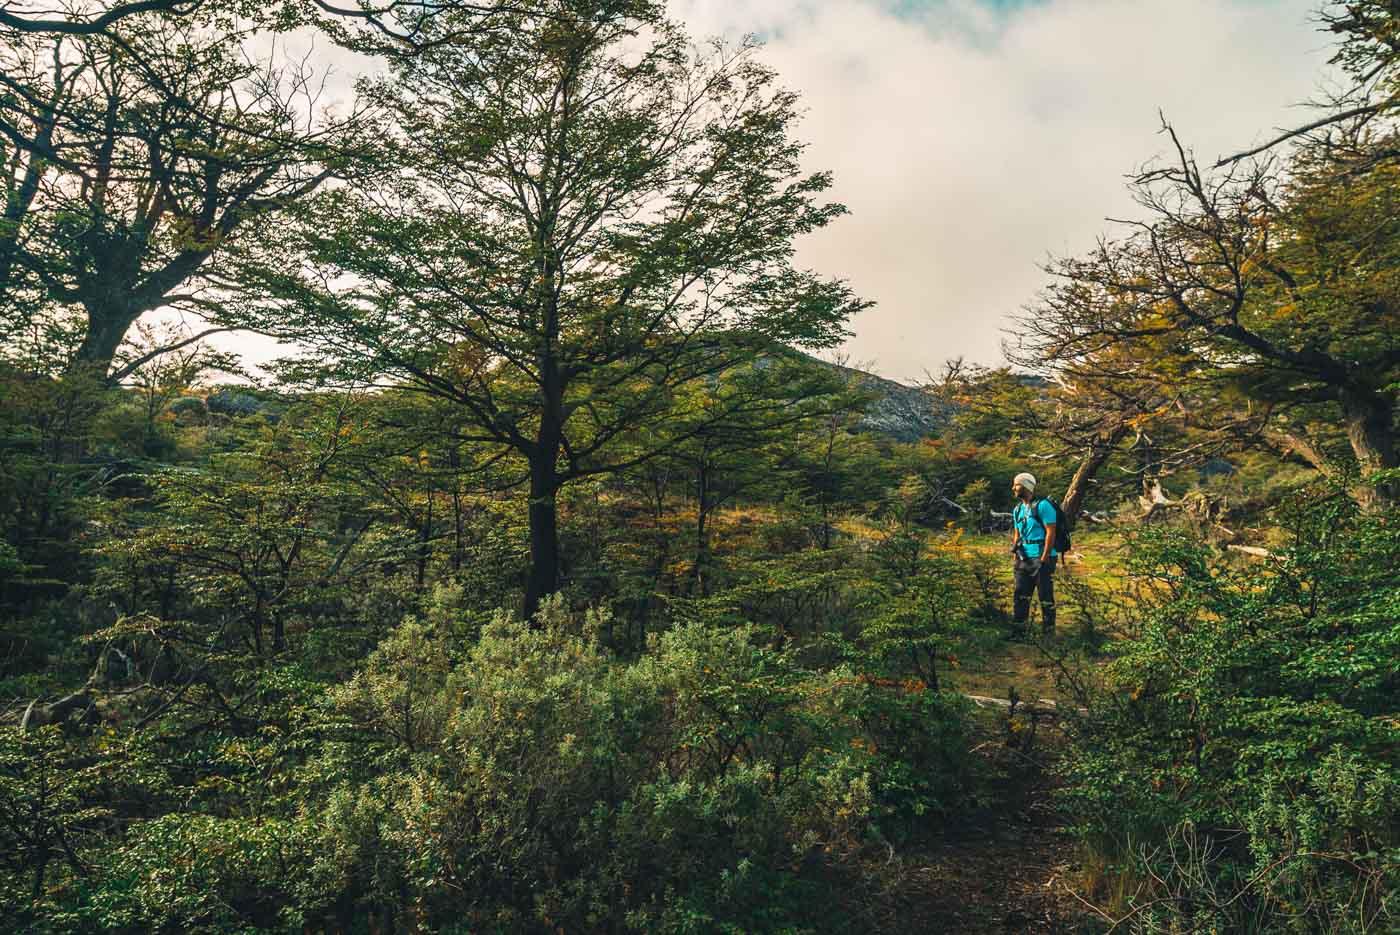 Max en route to the top of Cerro Queso